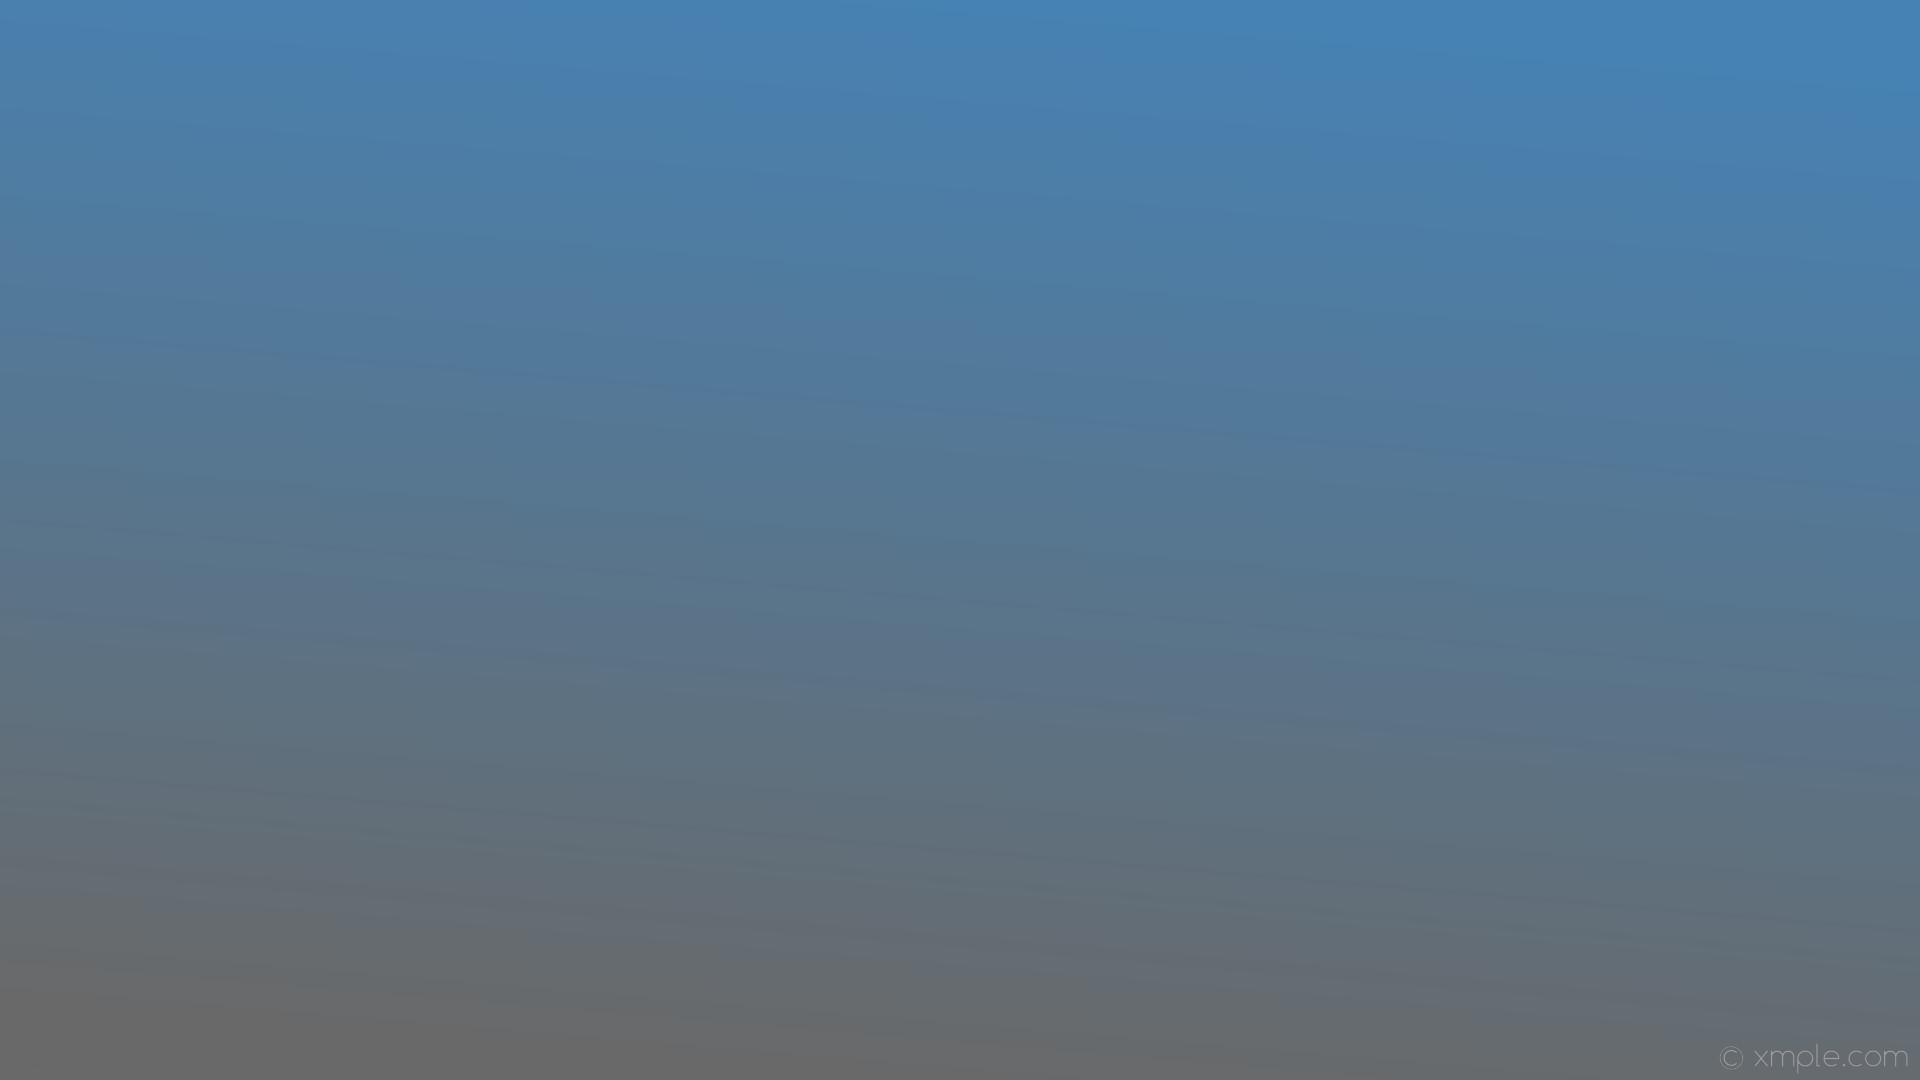 wallpaper gradient linear blue grey dim gray steel blue #696969 #4682b4 255°